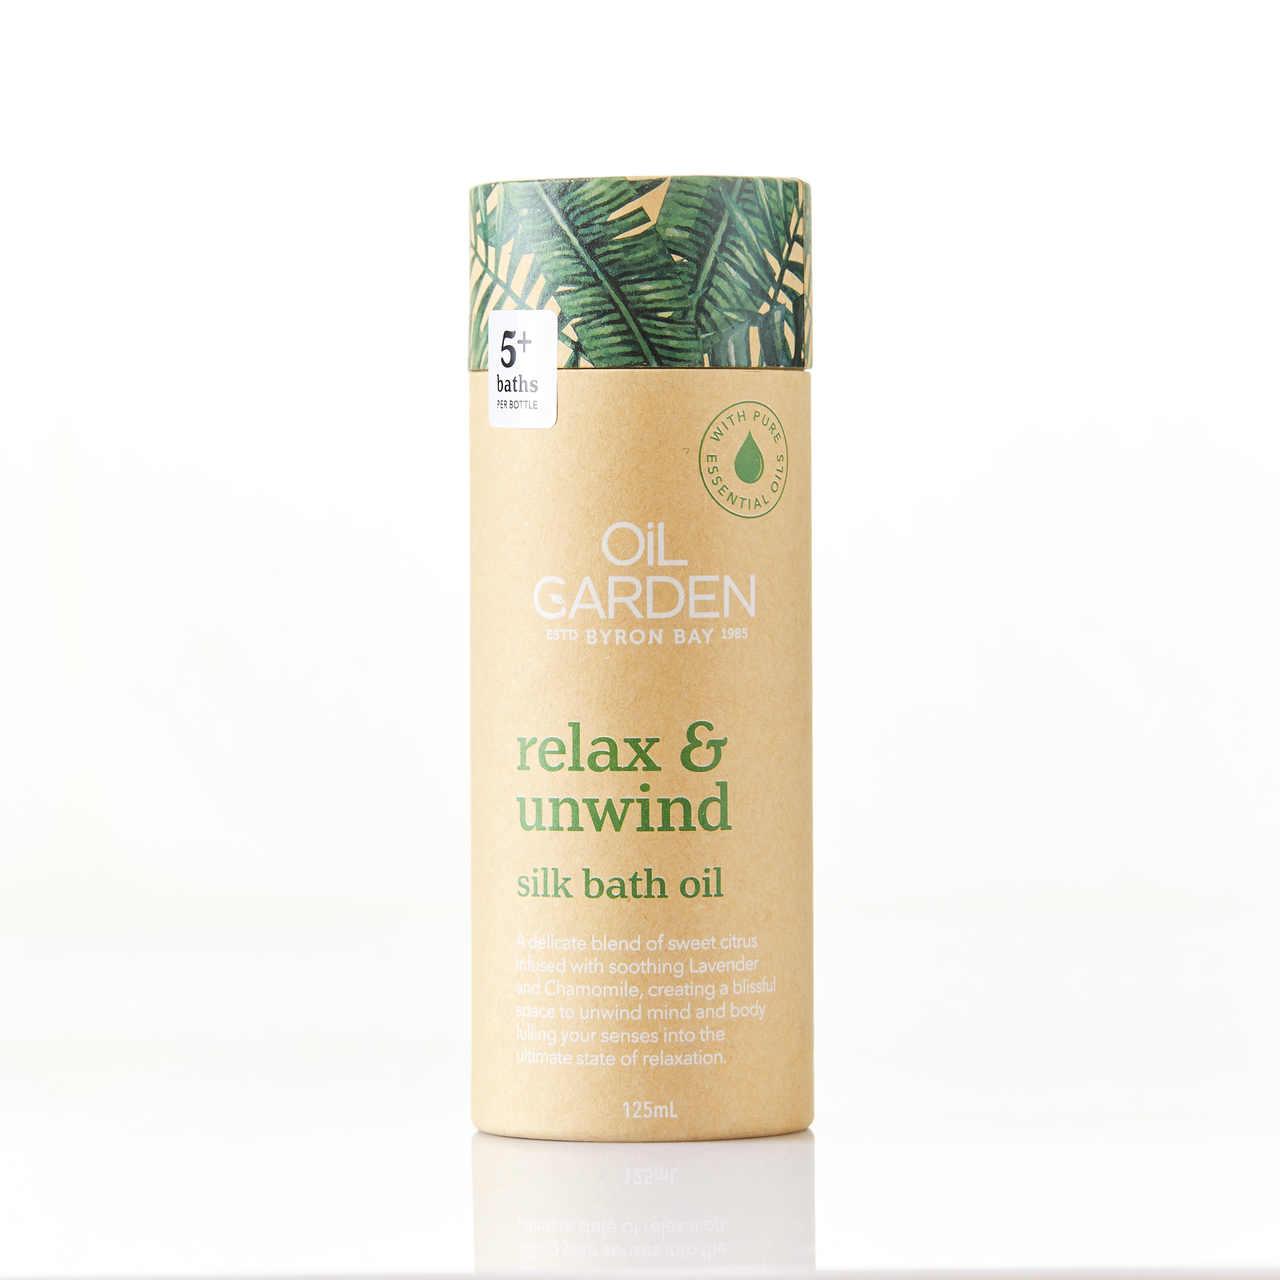 Oil Garden Relax & Unwind Silk Bath Oil 125mL 6670113